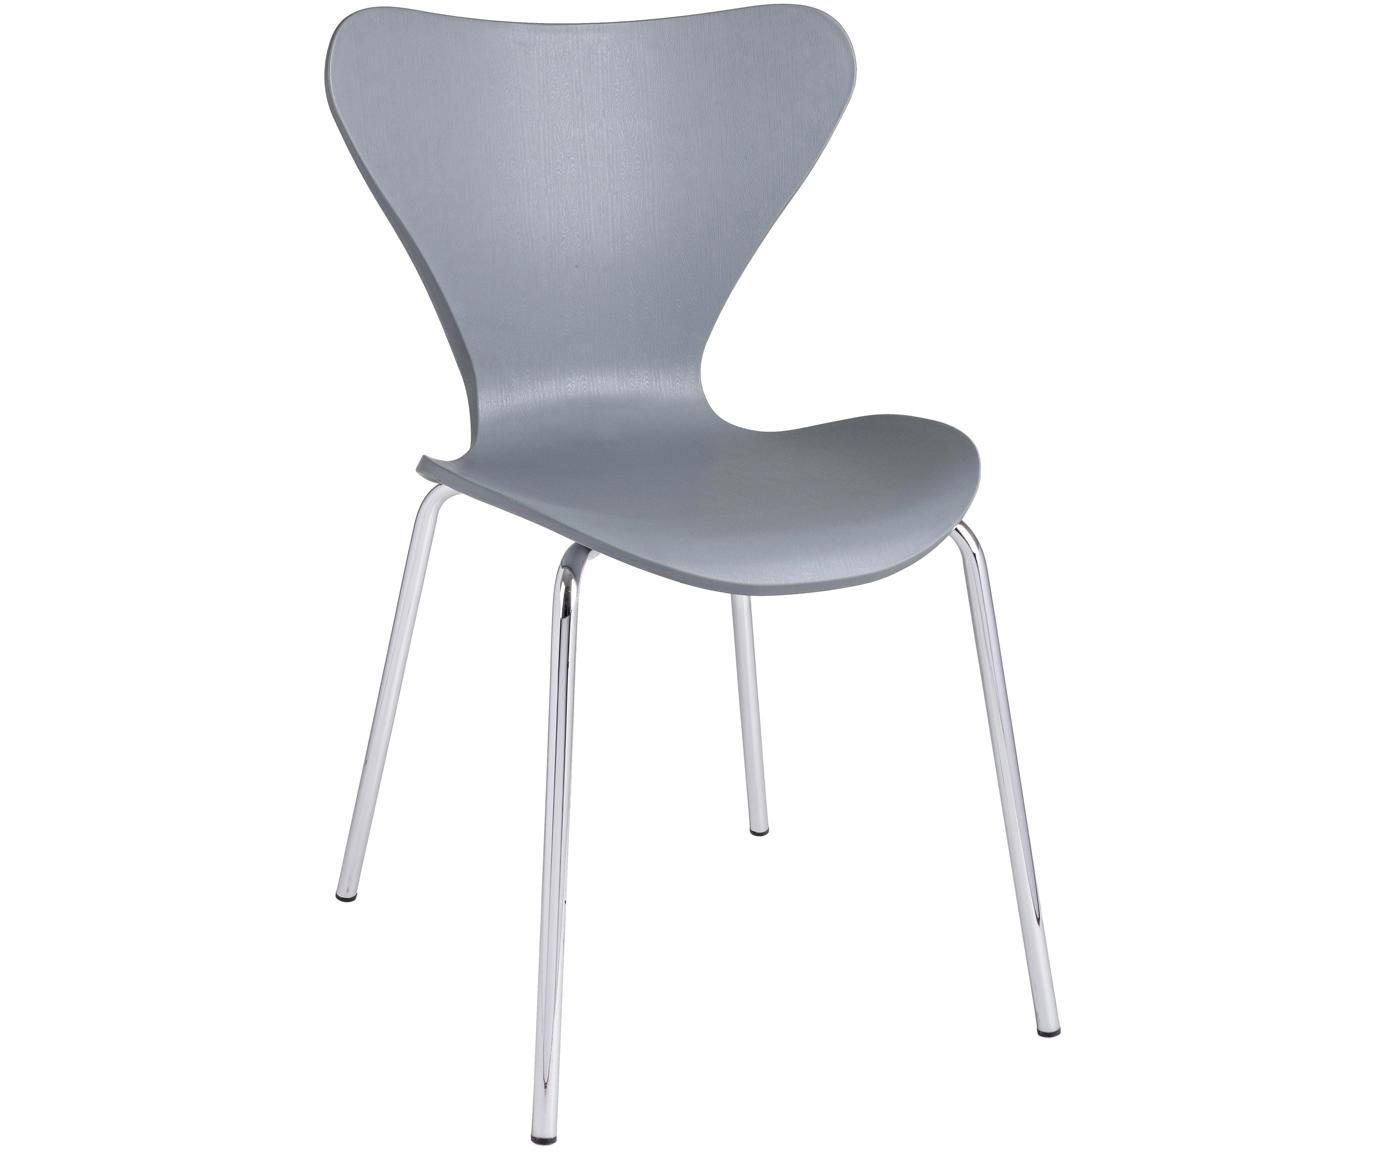 Stapelbare Kunststoffstühle Tessa, 2 Stück, Sitzfläche: Kunststoff (Polypropylen), Beine: Metall, verchromt, Hellgrau, Chrom, B 50 x T 50 cm